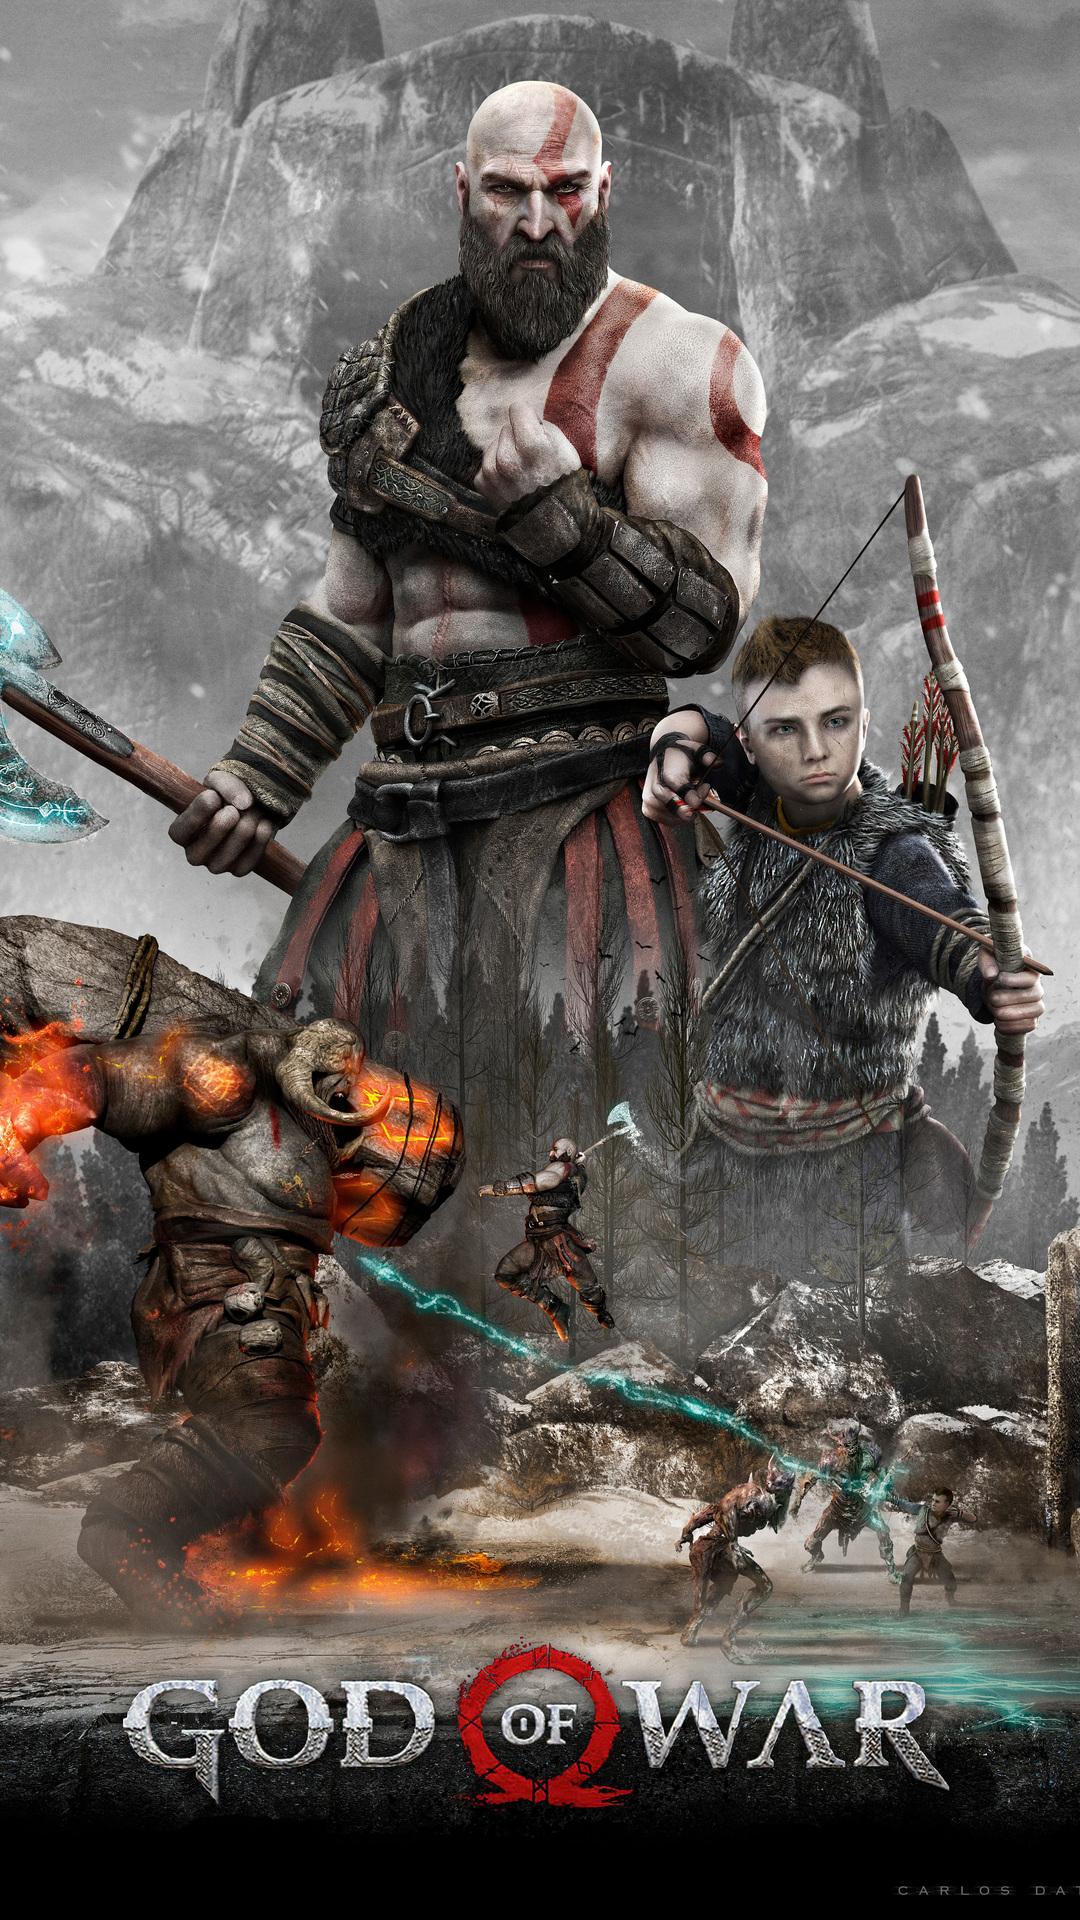 1080x1920 kratos and atreus god of war 4 4k 2018 iphone 7 6s 6 plus pixel xl one plus 3 3t 5 - Wallpaper kratos ...